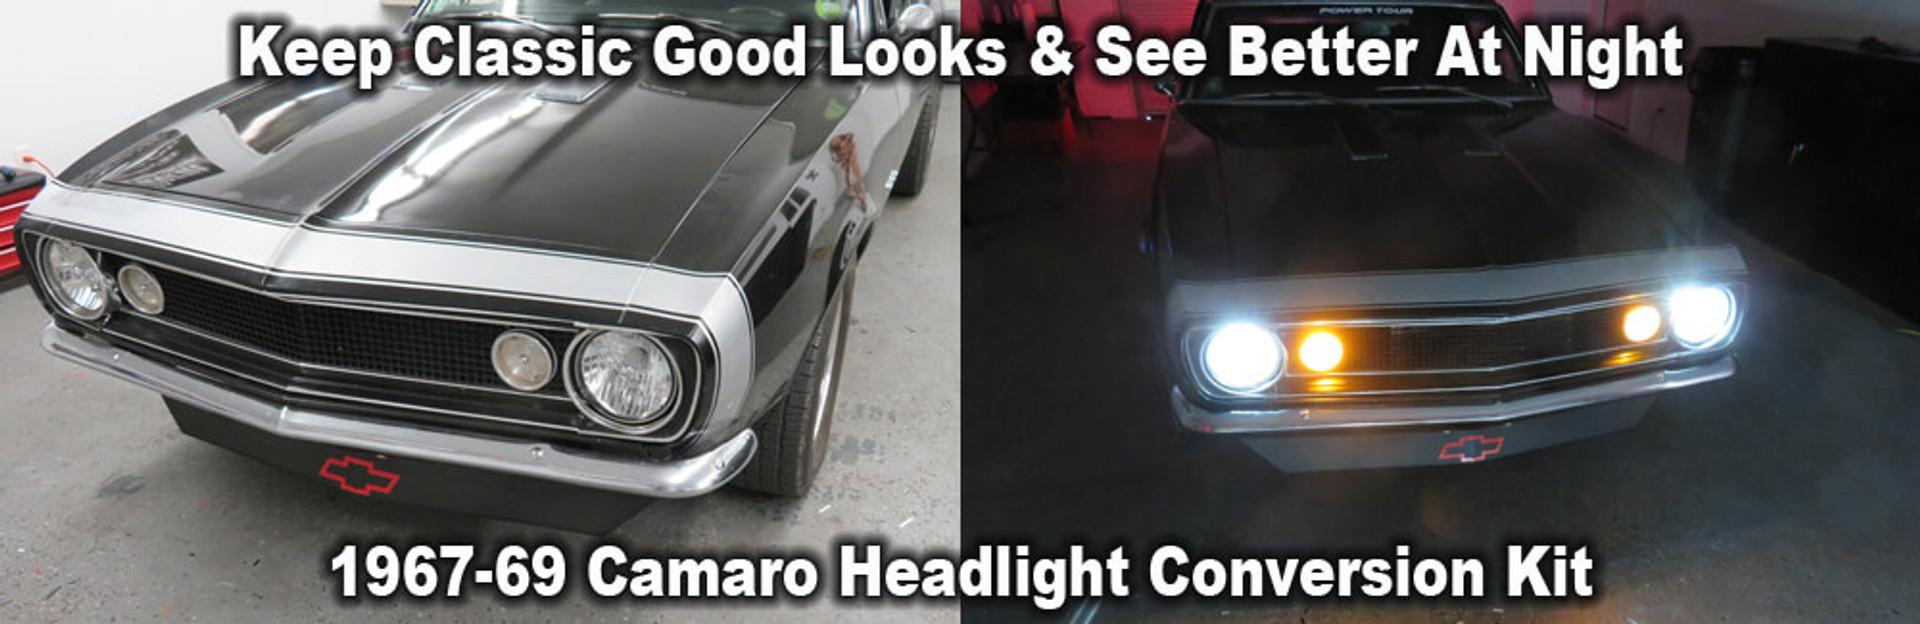 1967-69 Camaro Headlight Conversion Kit